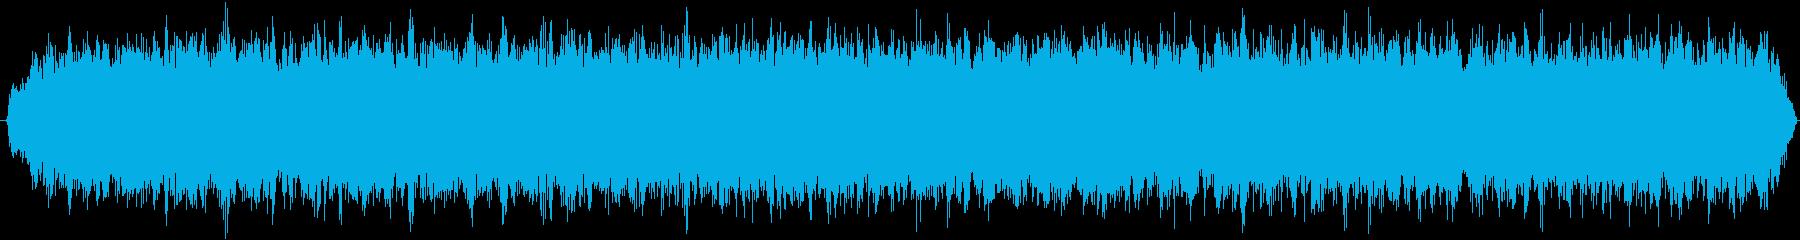 PADS 合唱団ハム02の再生済みの波形